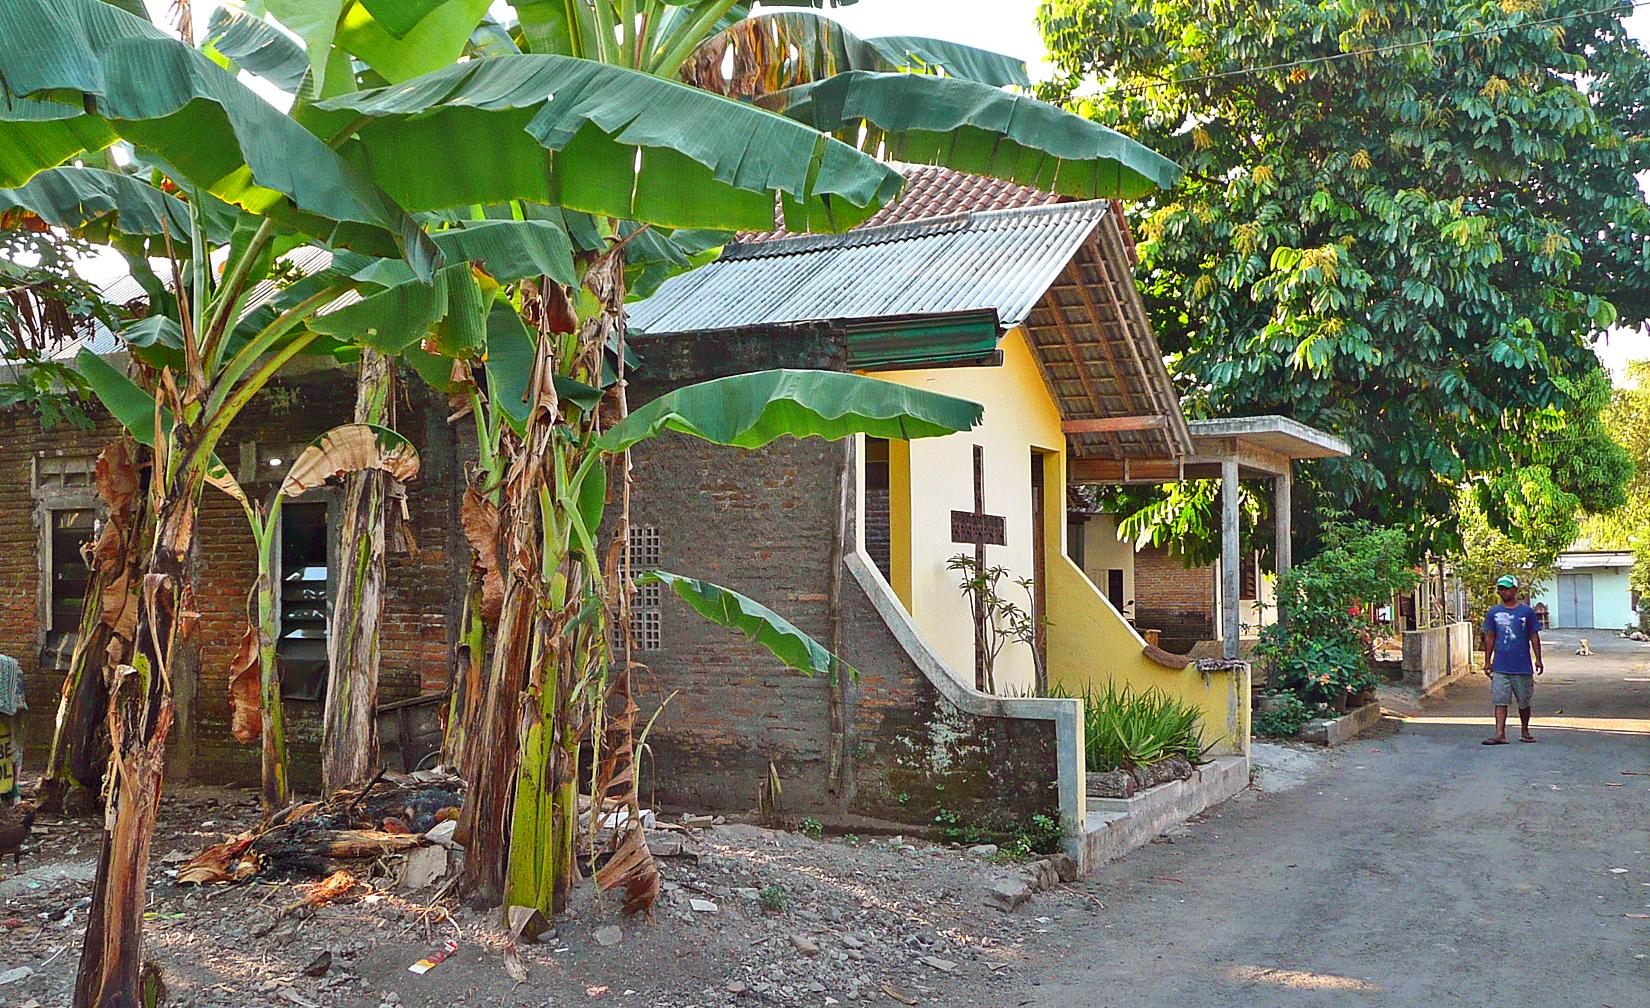 Indonesia: FMI field visit finds increase in radical Islamic presence